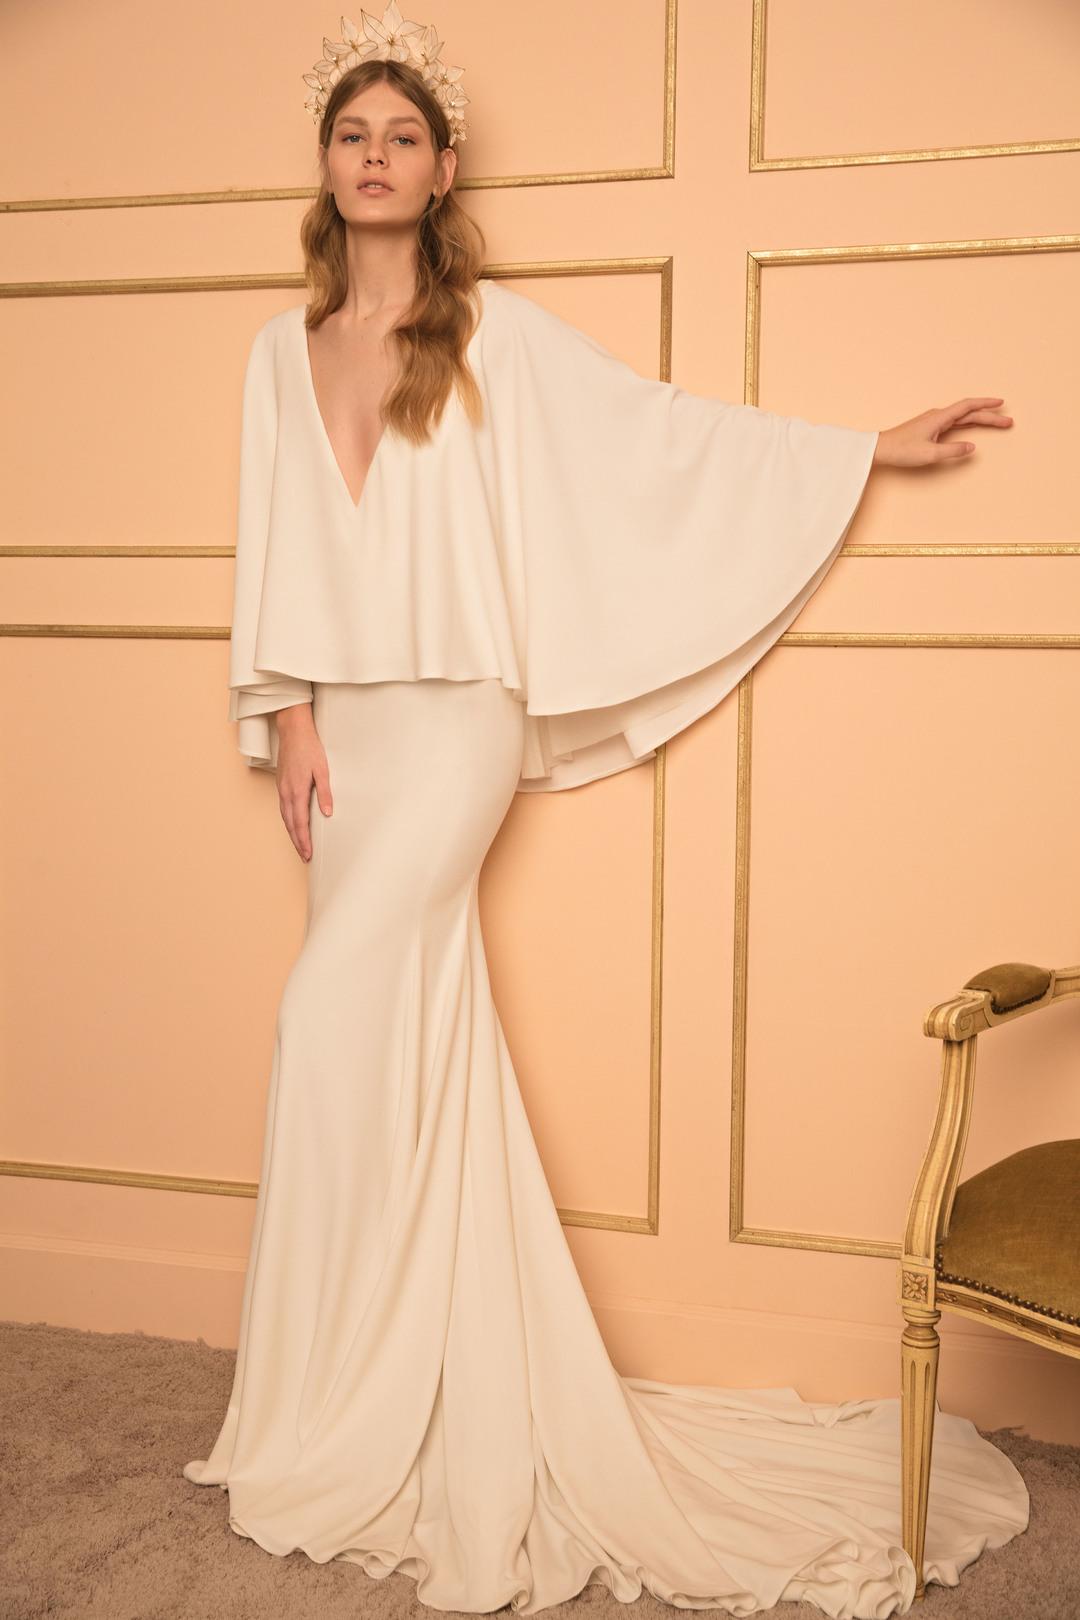 marni dress photo